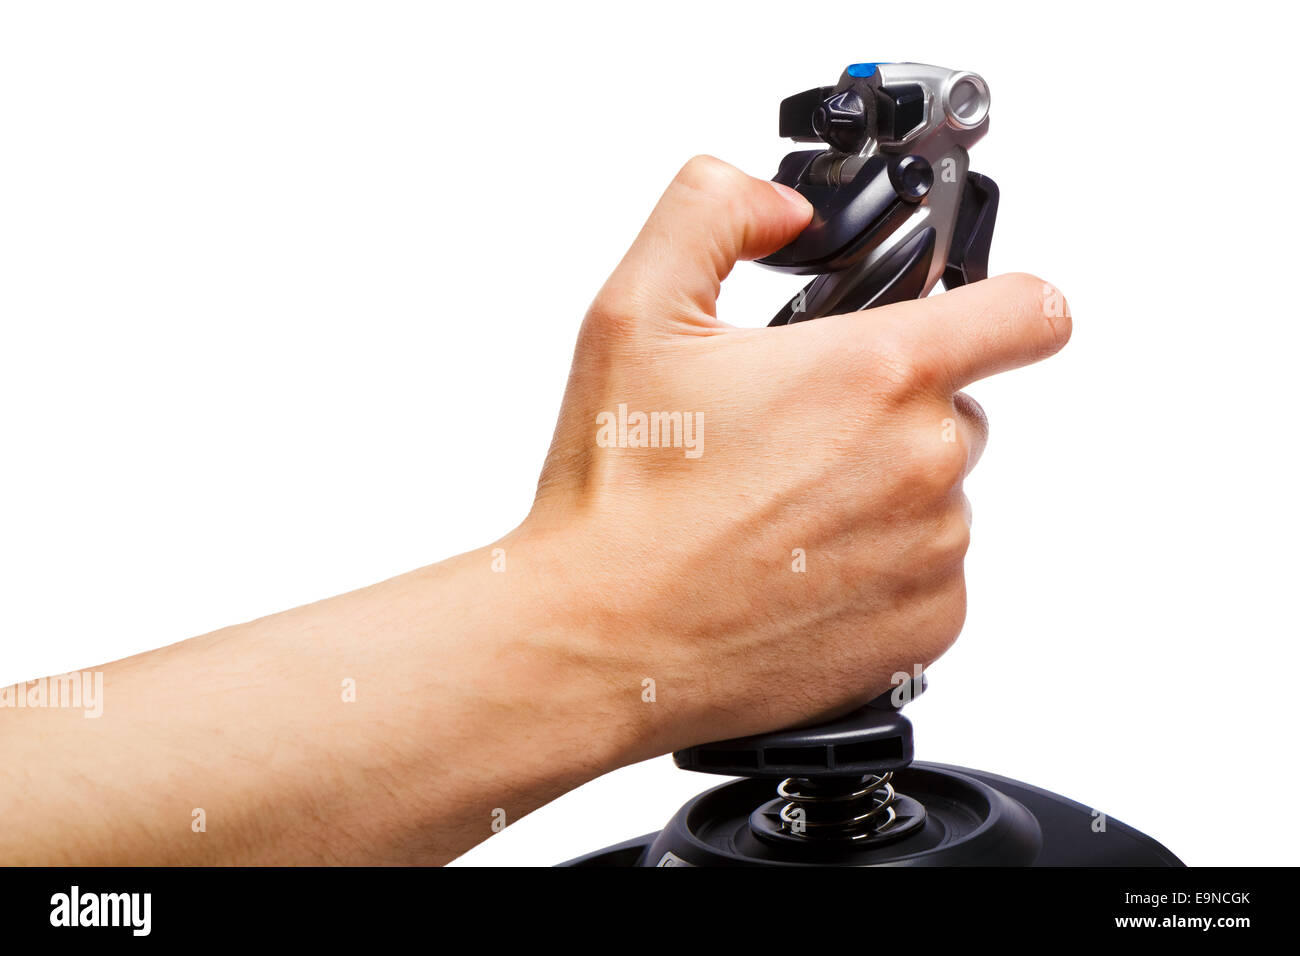 hand joystick control flight simulator - Stock Image